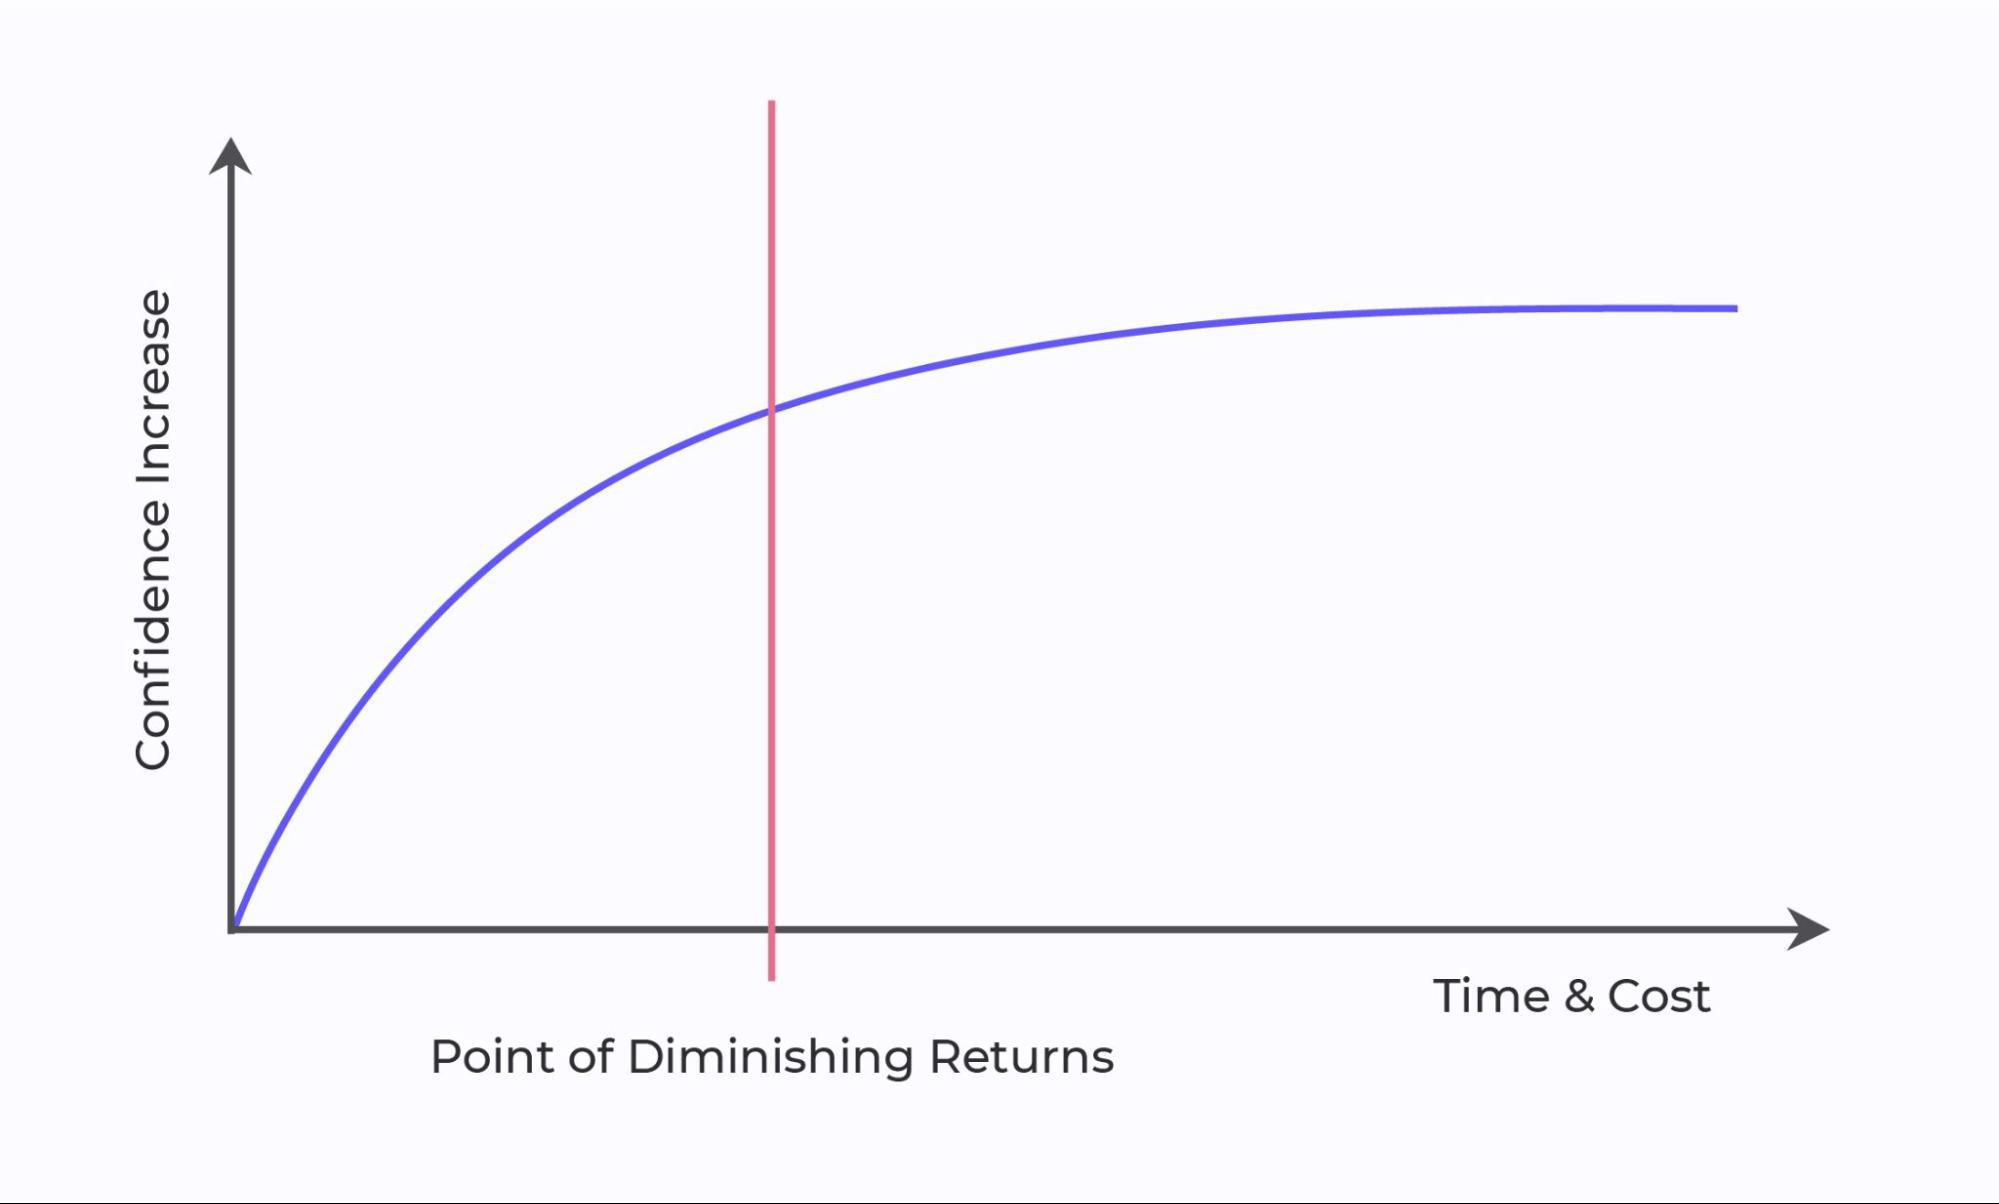 Upstream Kanban: the Point of Diminishing Returns